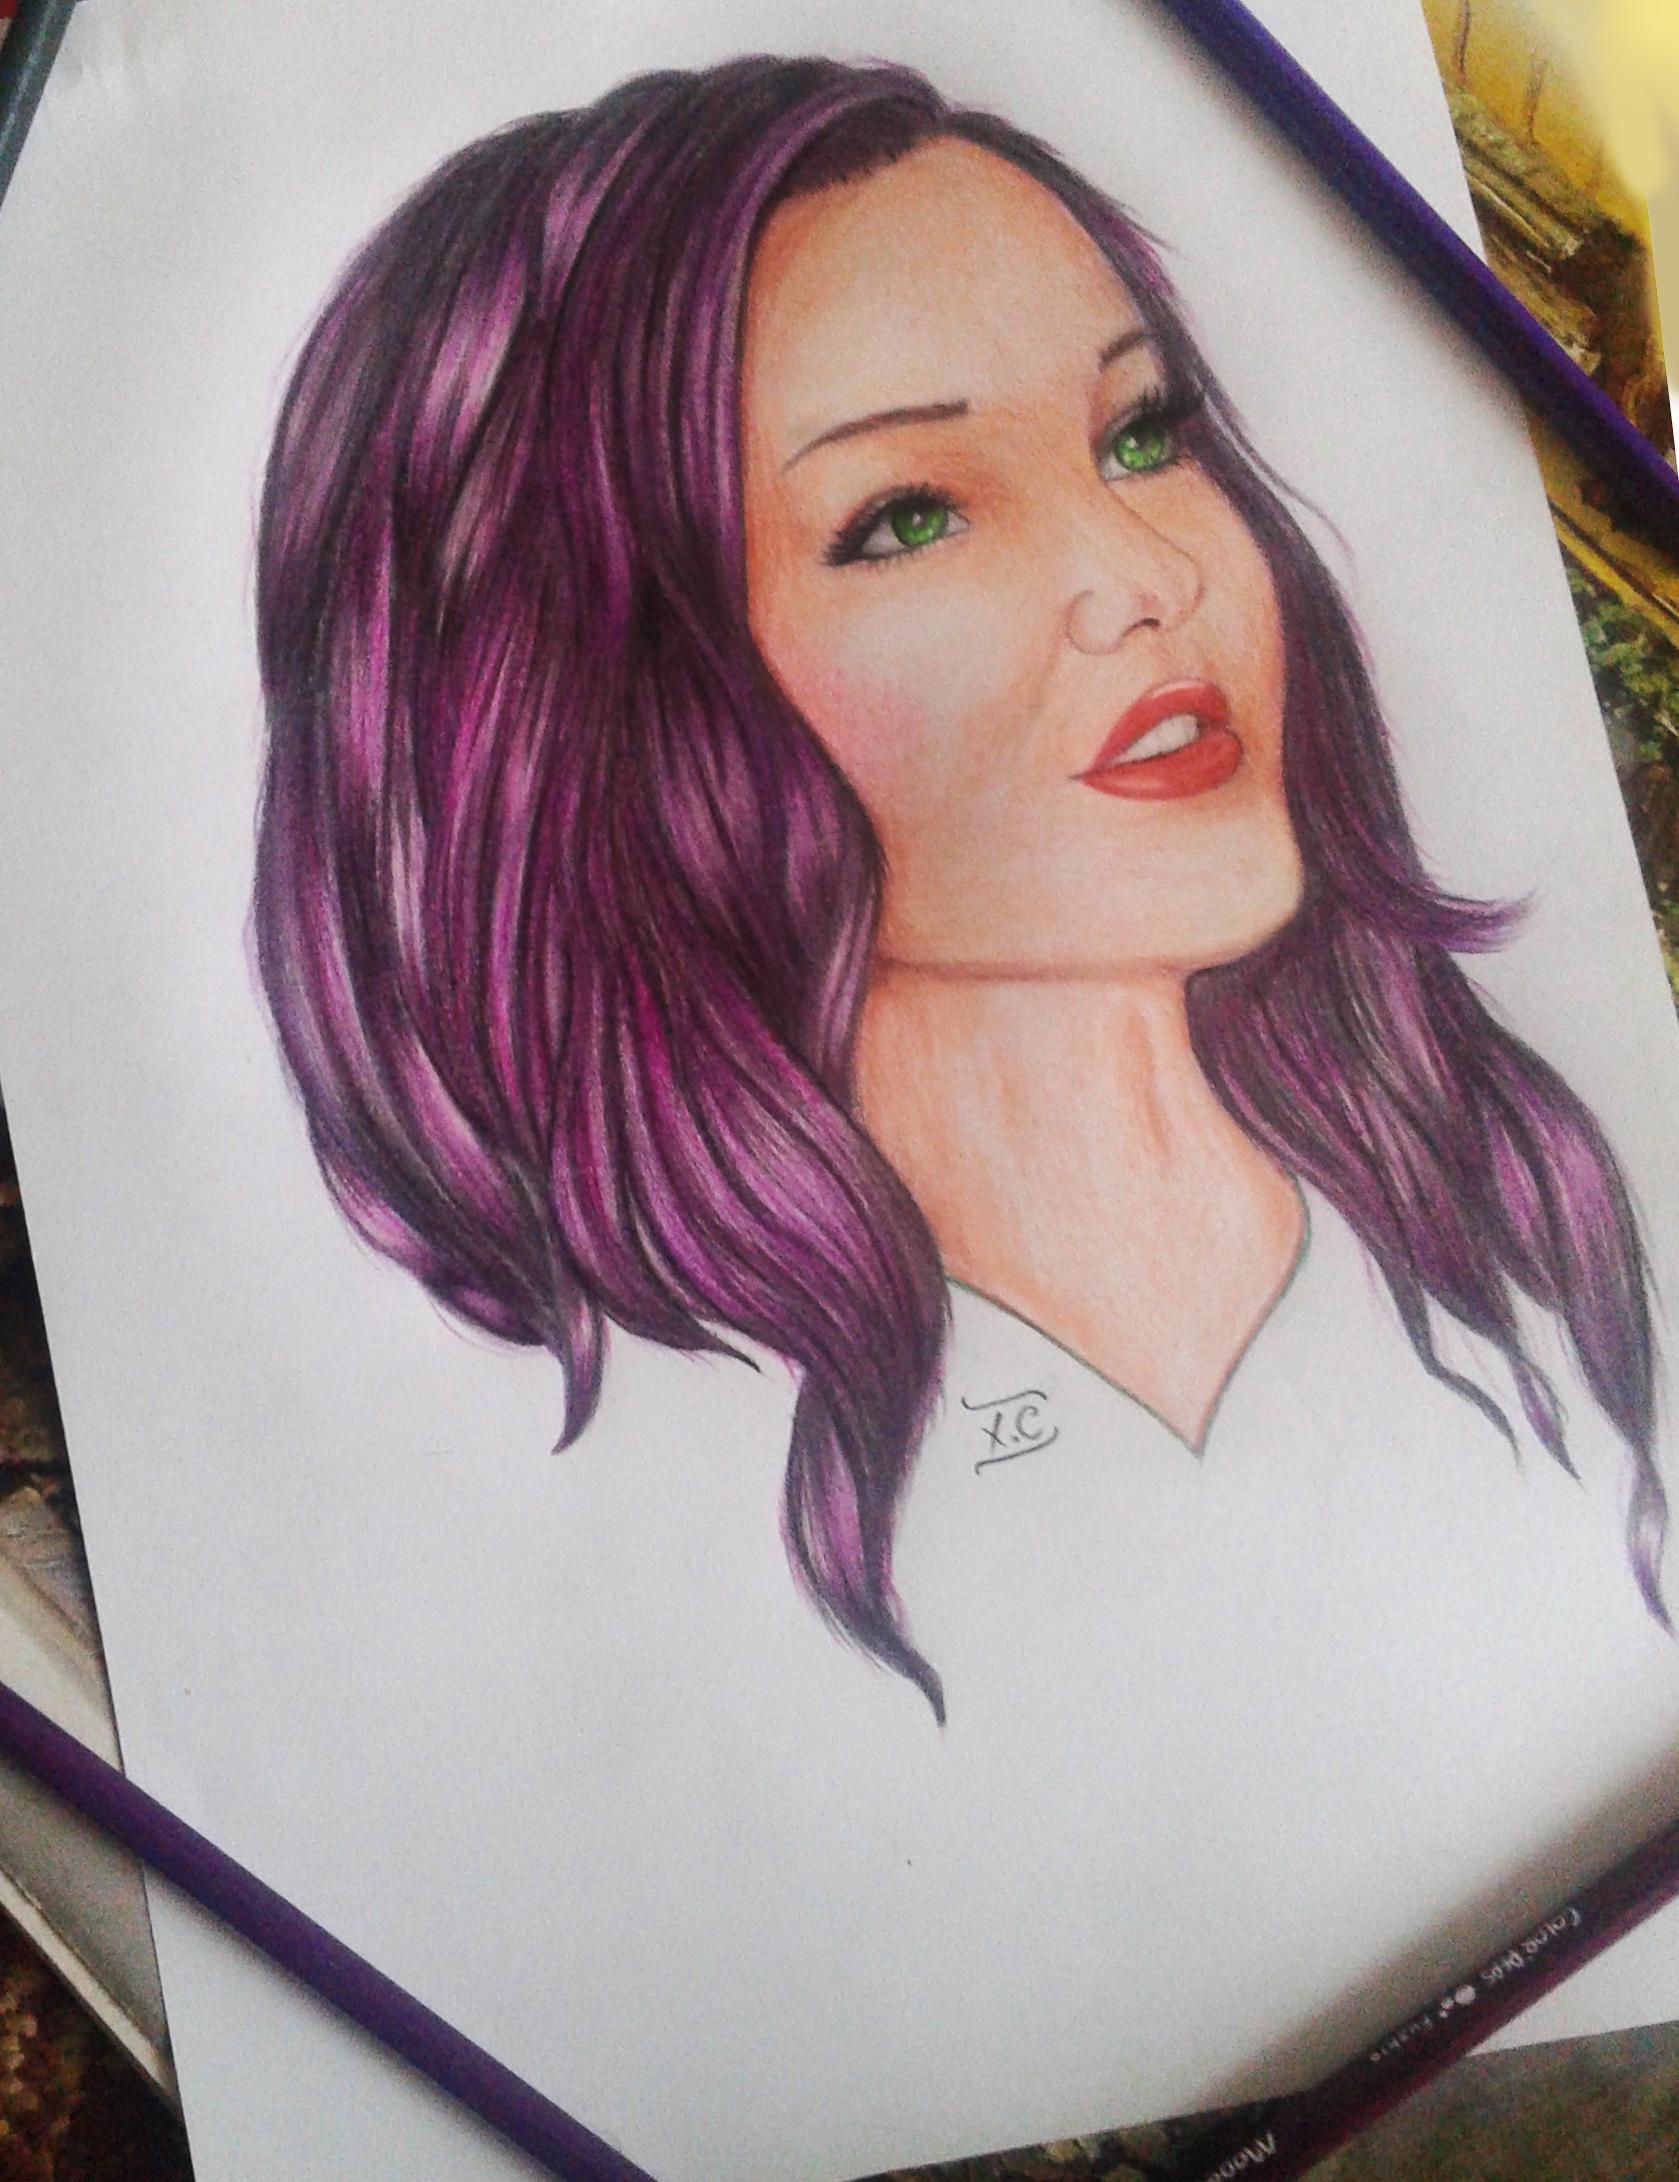 image Dove cameron with purple hair looking like a cartoon